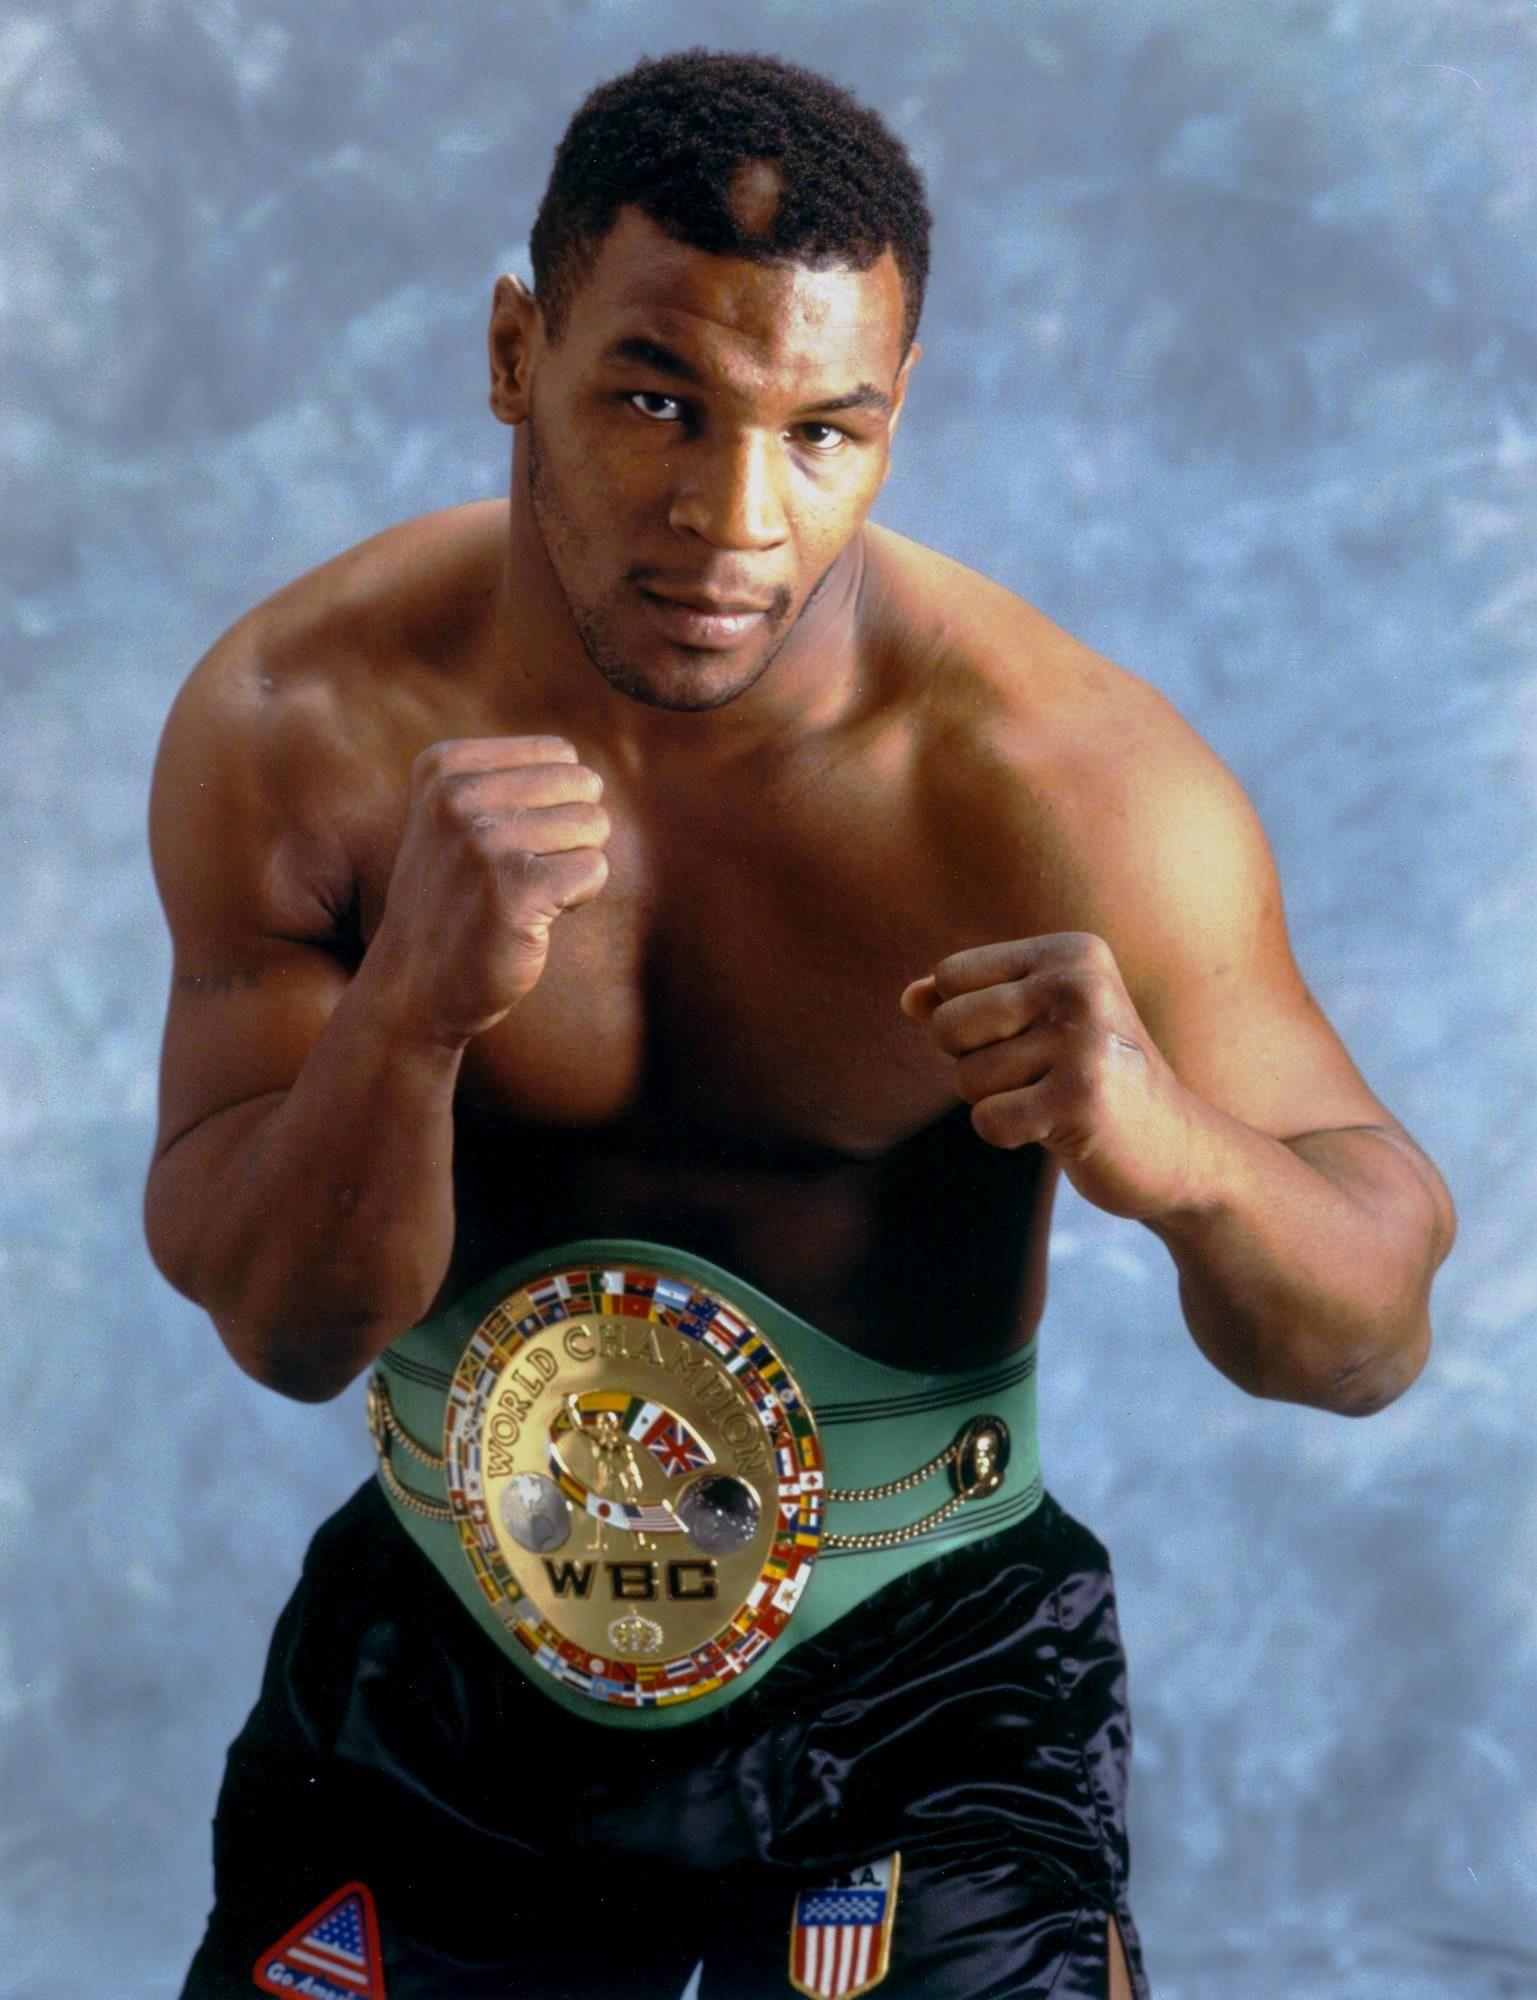 Mike Tyson Mike tyson, Mike tyson boxing, Champion sports